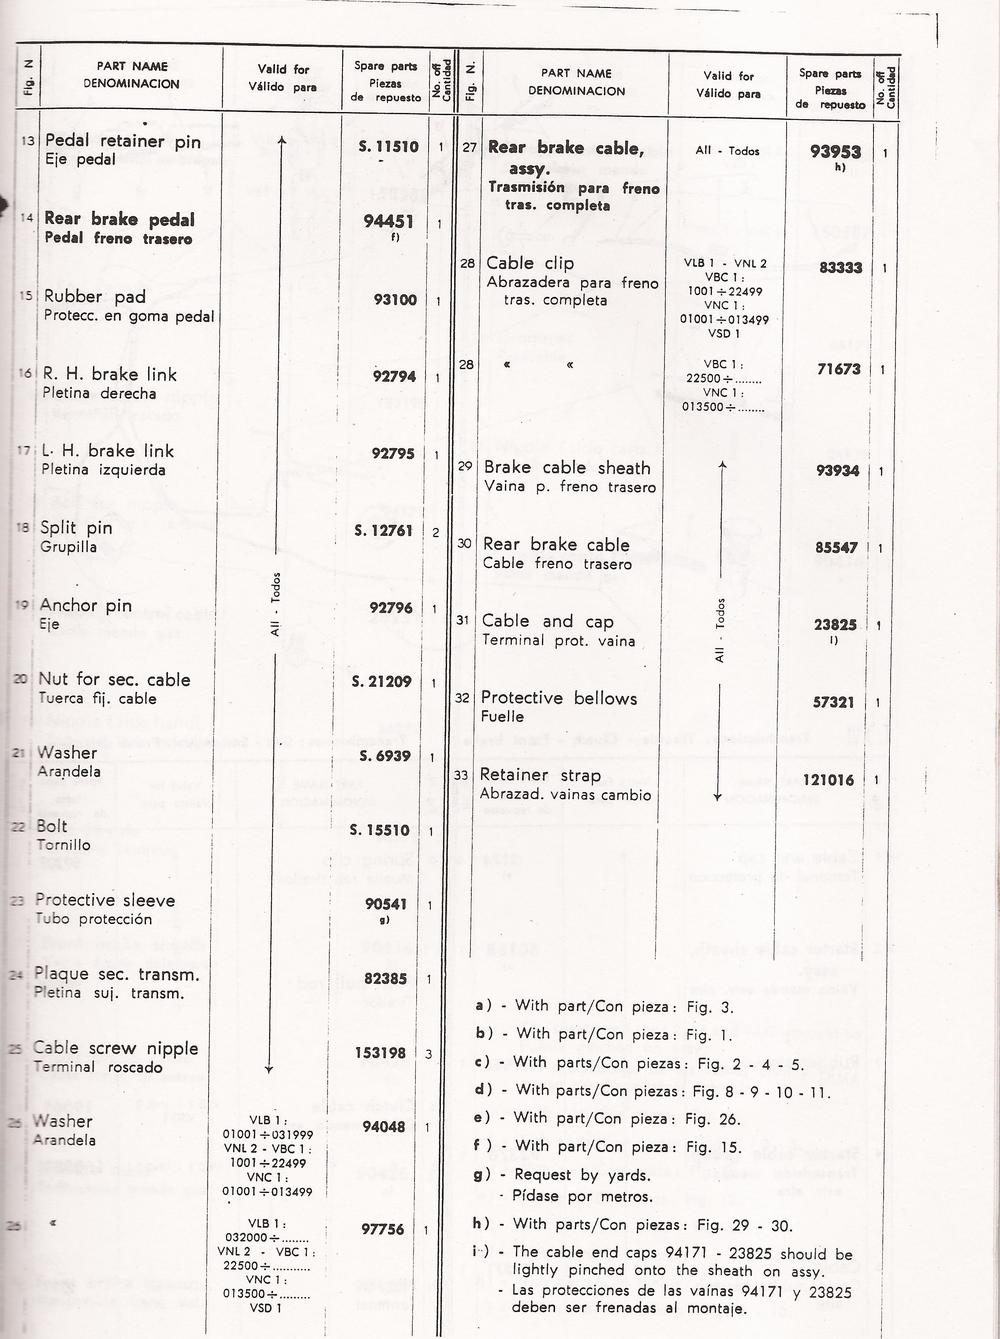 02-25-2013 vespa manaul 57.jpg